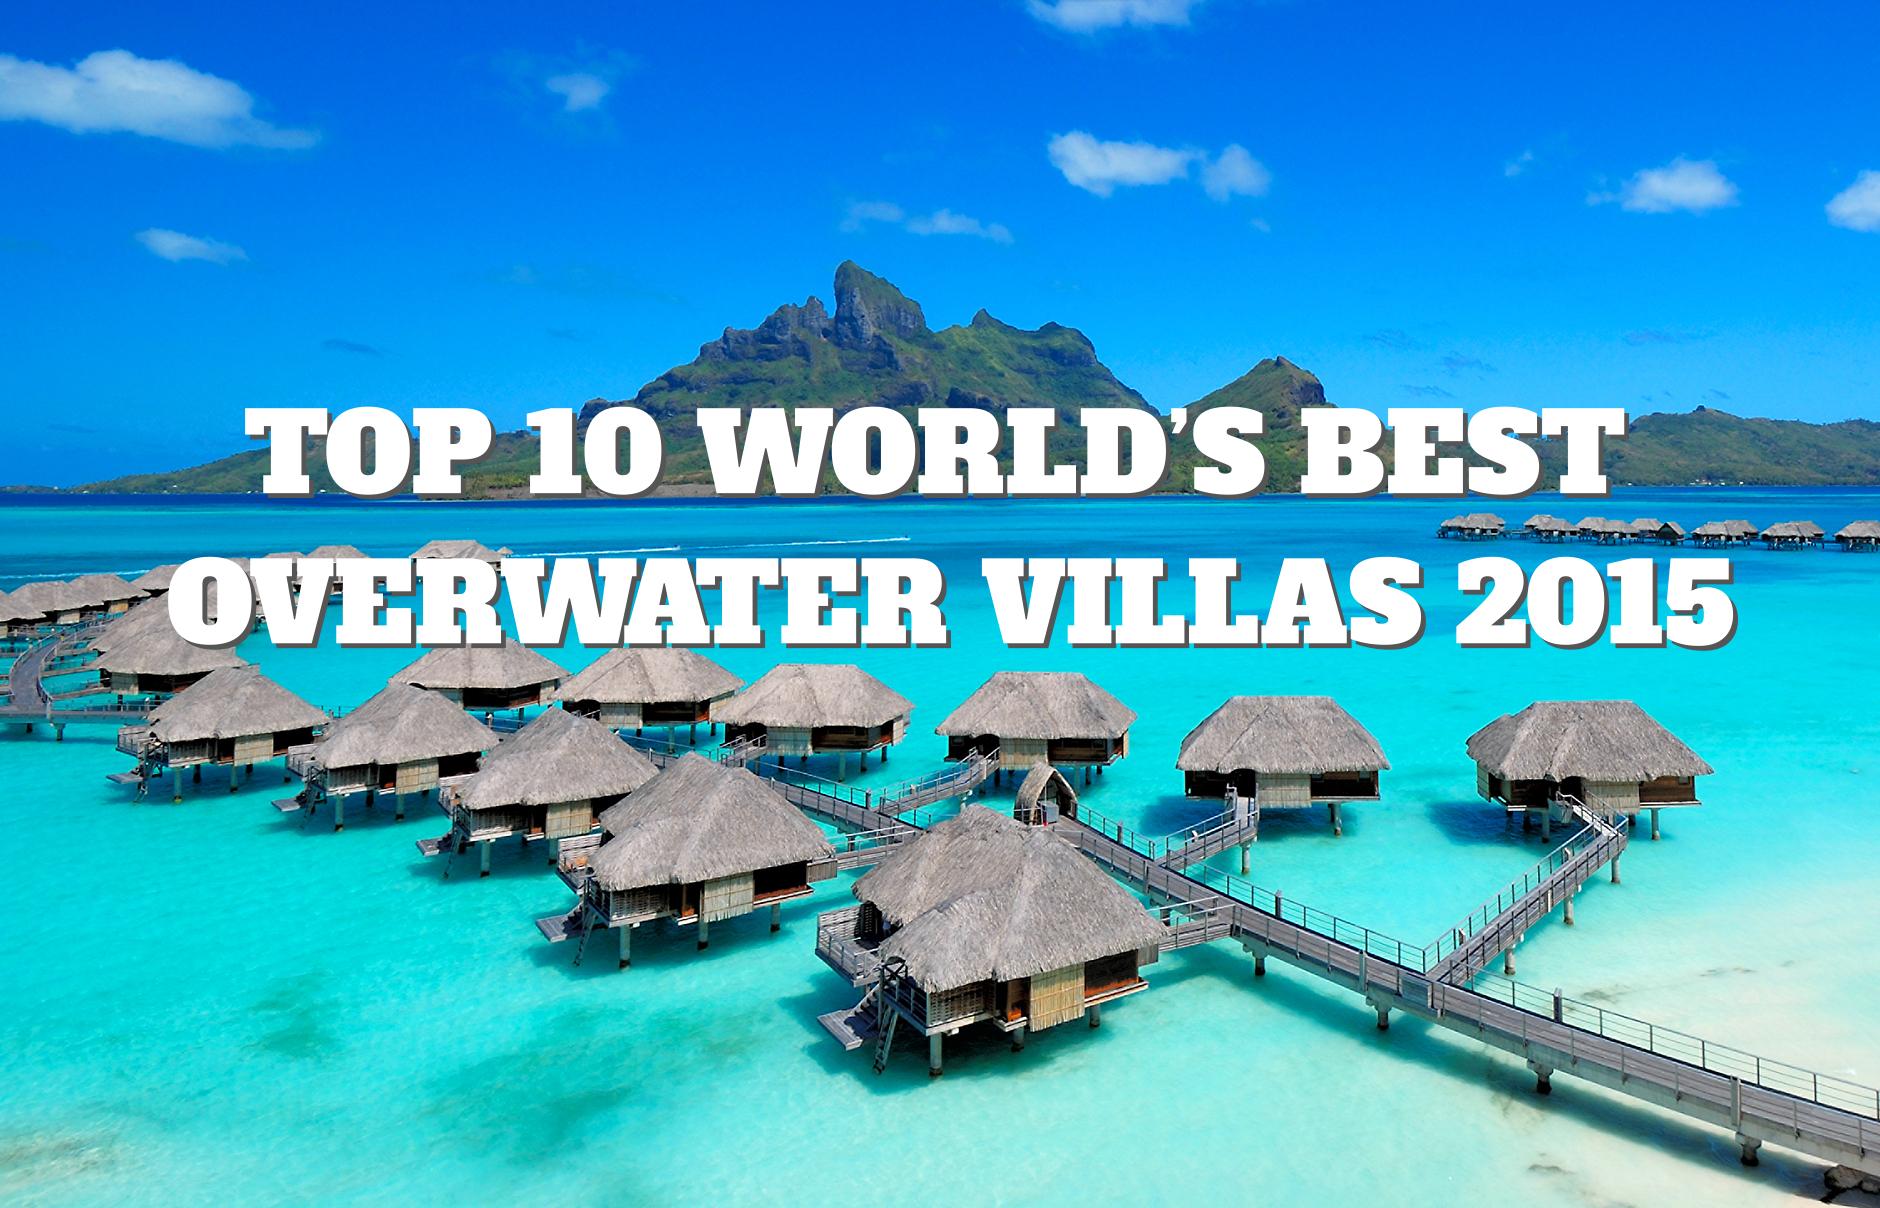 Top 10 Worlds Best Overwater Villas 2015